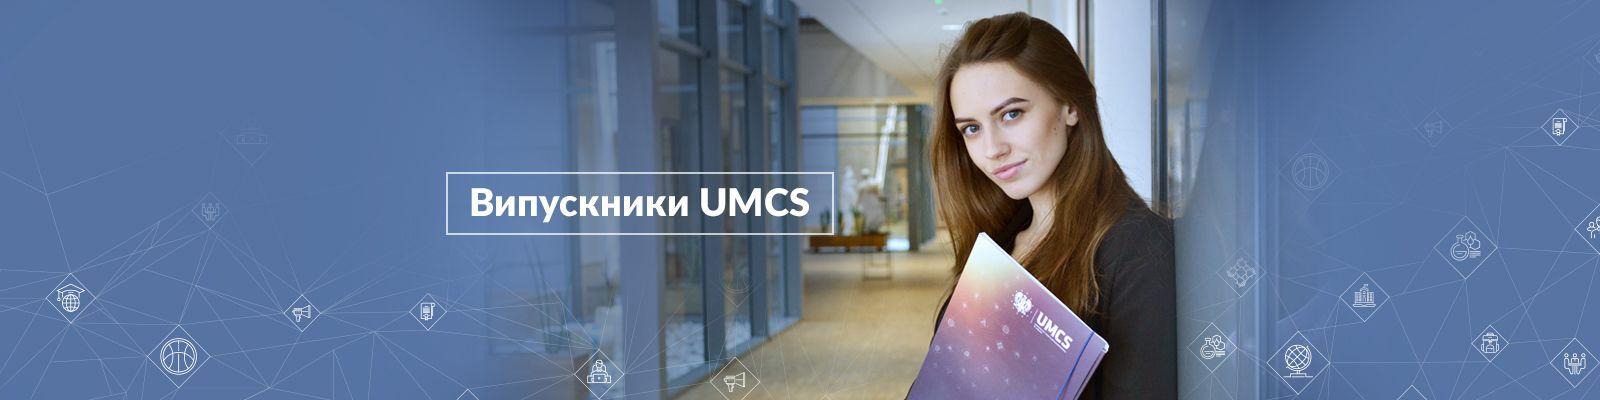 Випускники UMCS